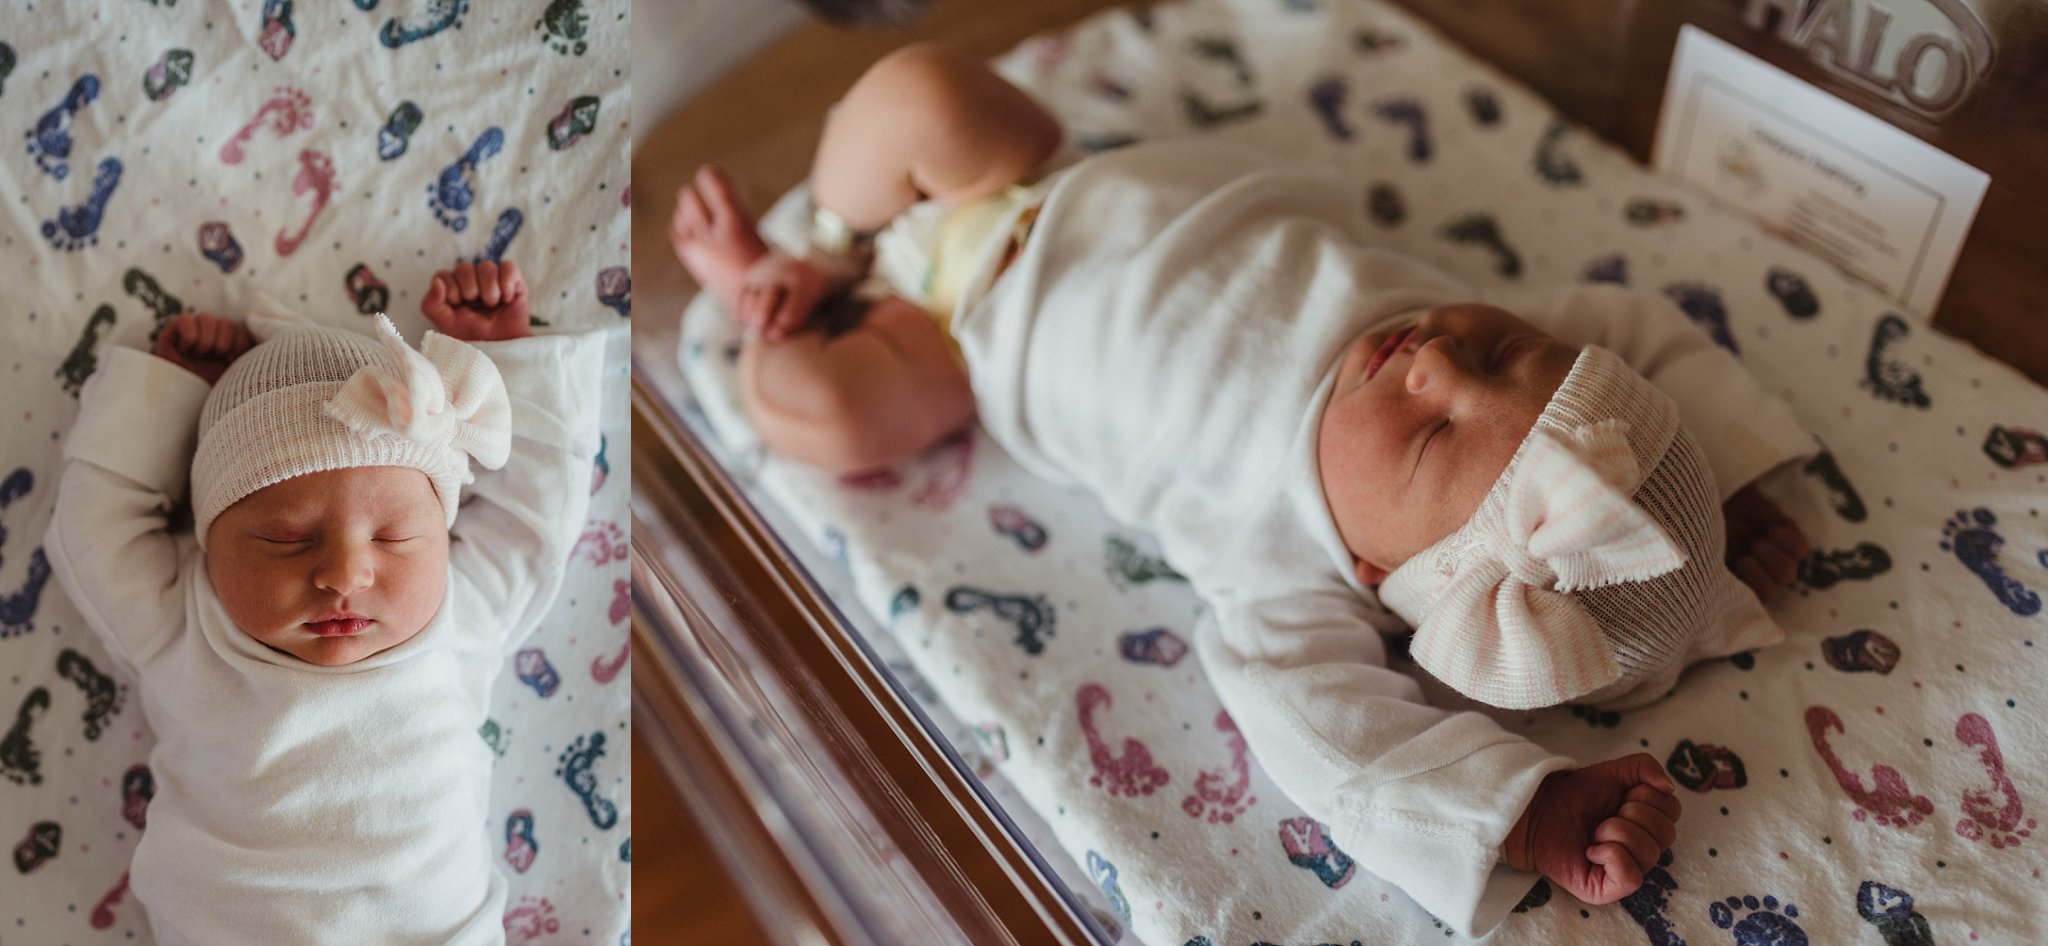 BrittneyHogue-BirthPhotographer-NewbornPhotographer-Fresh48Photographer-PeoriaIL-PekinIL-GalesburgIL-BloomingtonIL (11).jpg